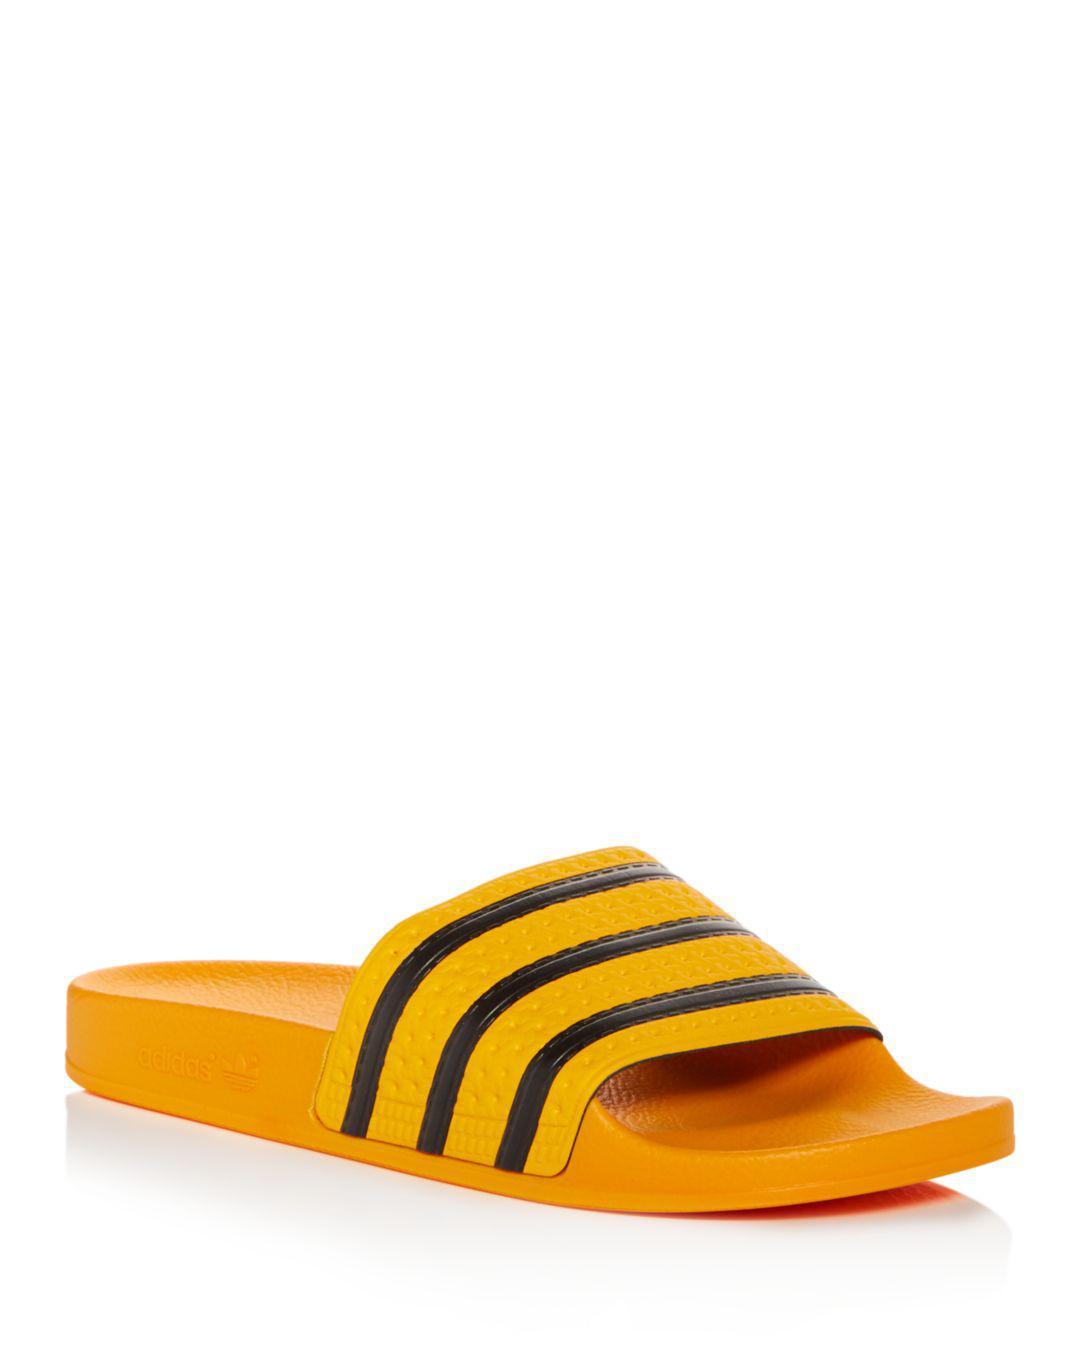 2f2ea21ccfec Lyst - adidas Men s Adilette Slide Sandals in Orange for Men